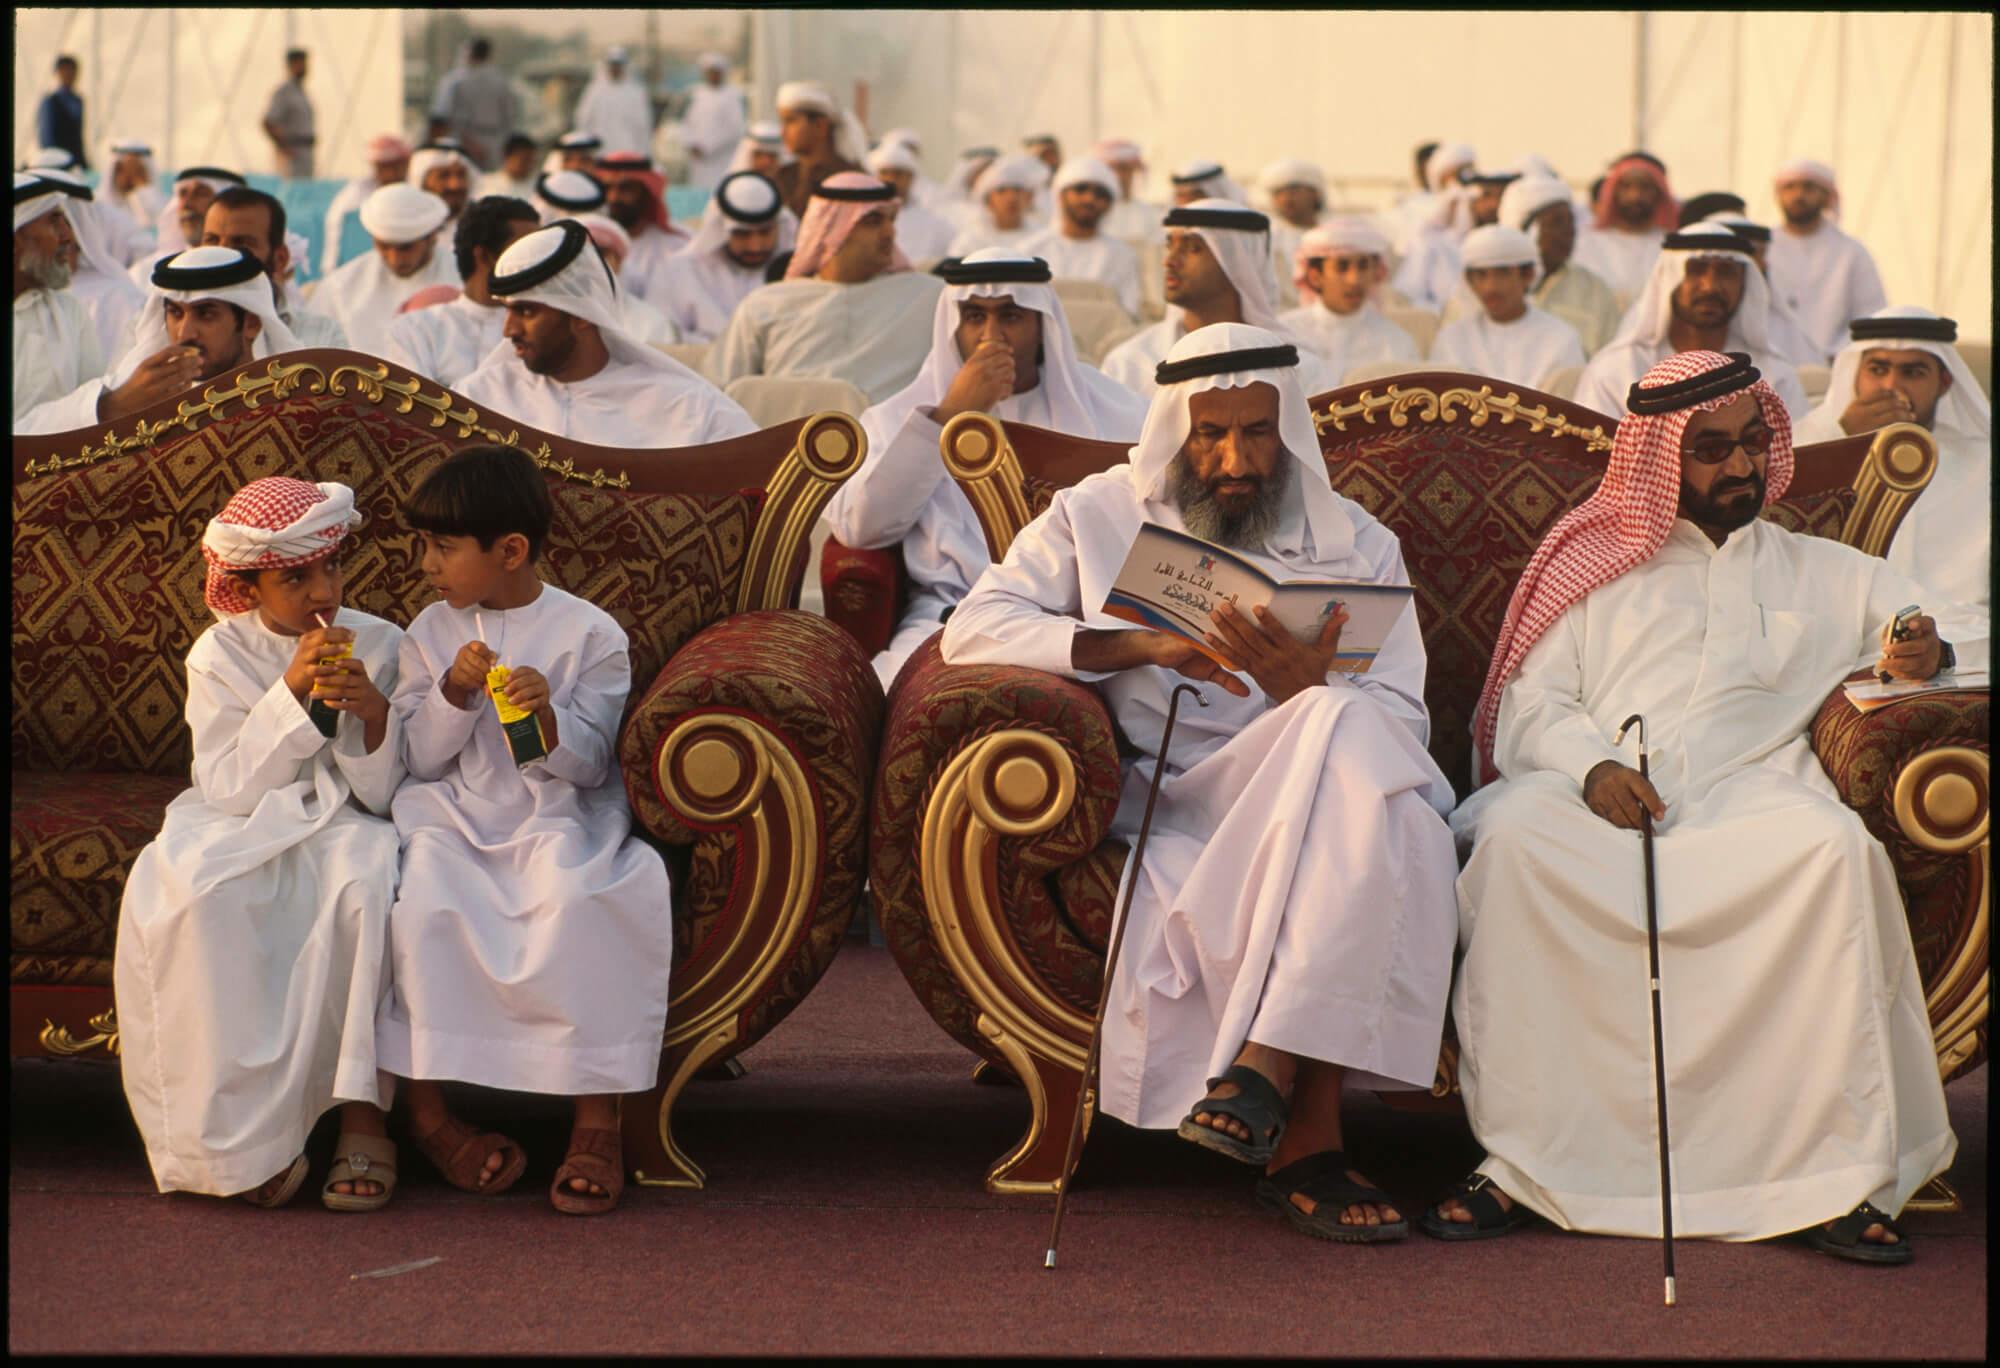 Steber_UAE_EMIRATI-MASS-WEDDING-copy